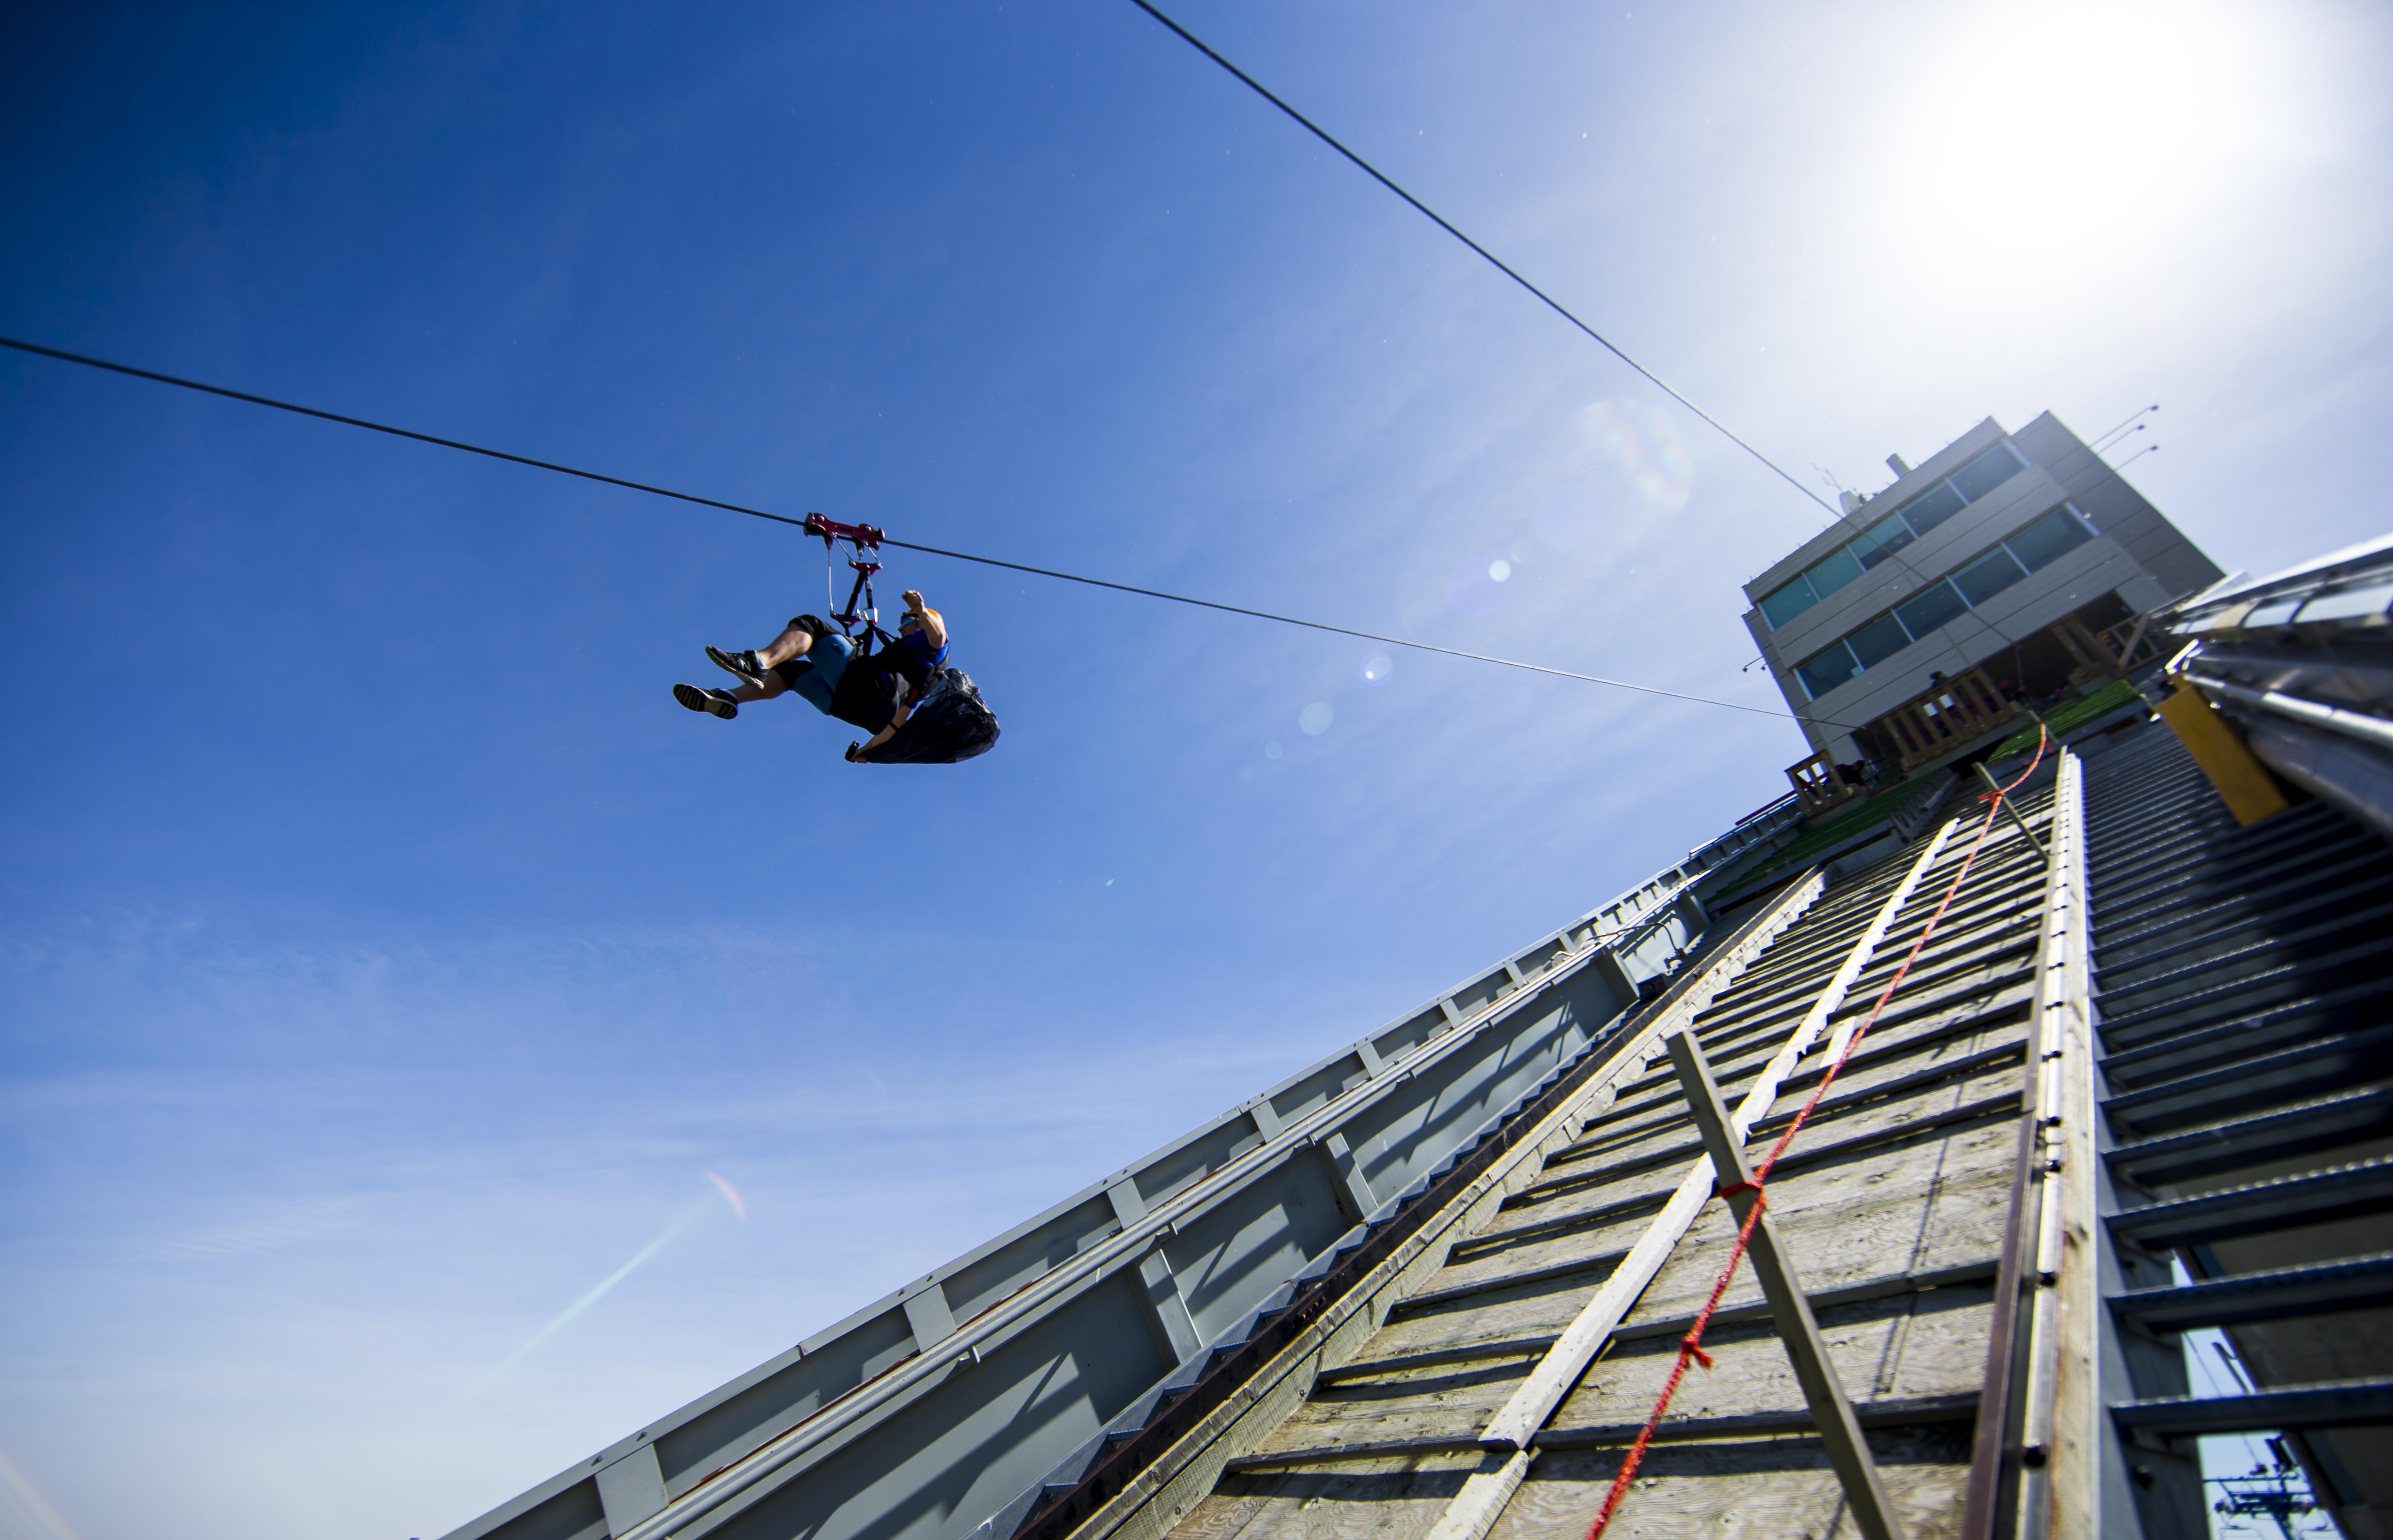 person on zipline at WinSport Calgary